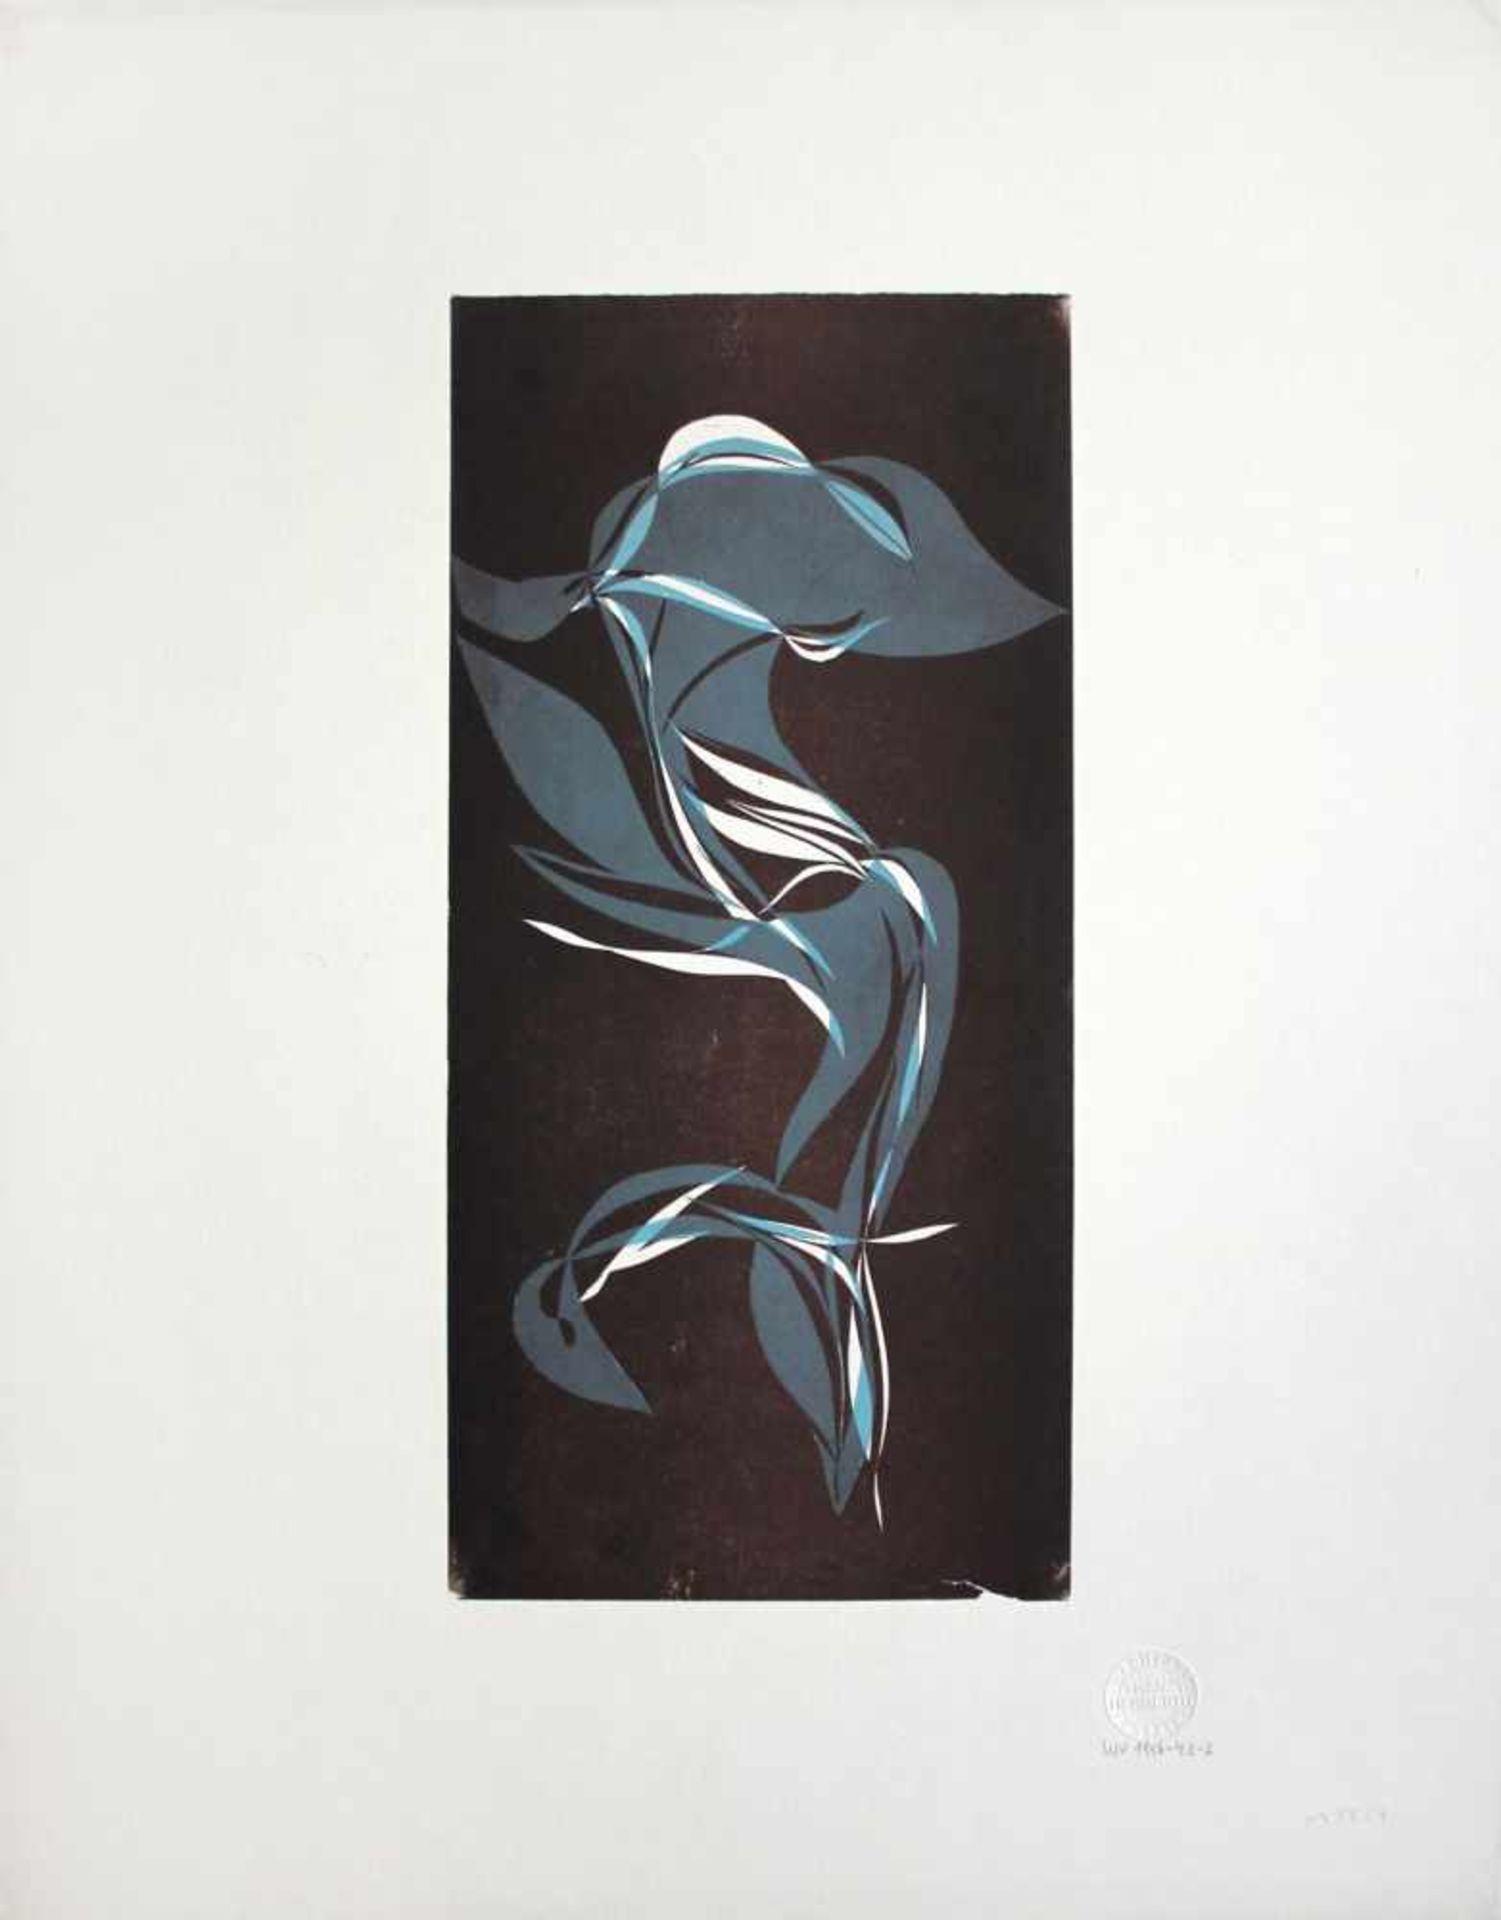 Franz Herbert geb. 1953 o.T. Linolschnitt Nachlass-Prägestempel 57 x 44 cm